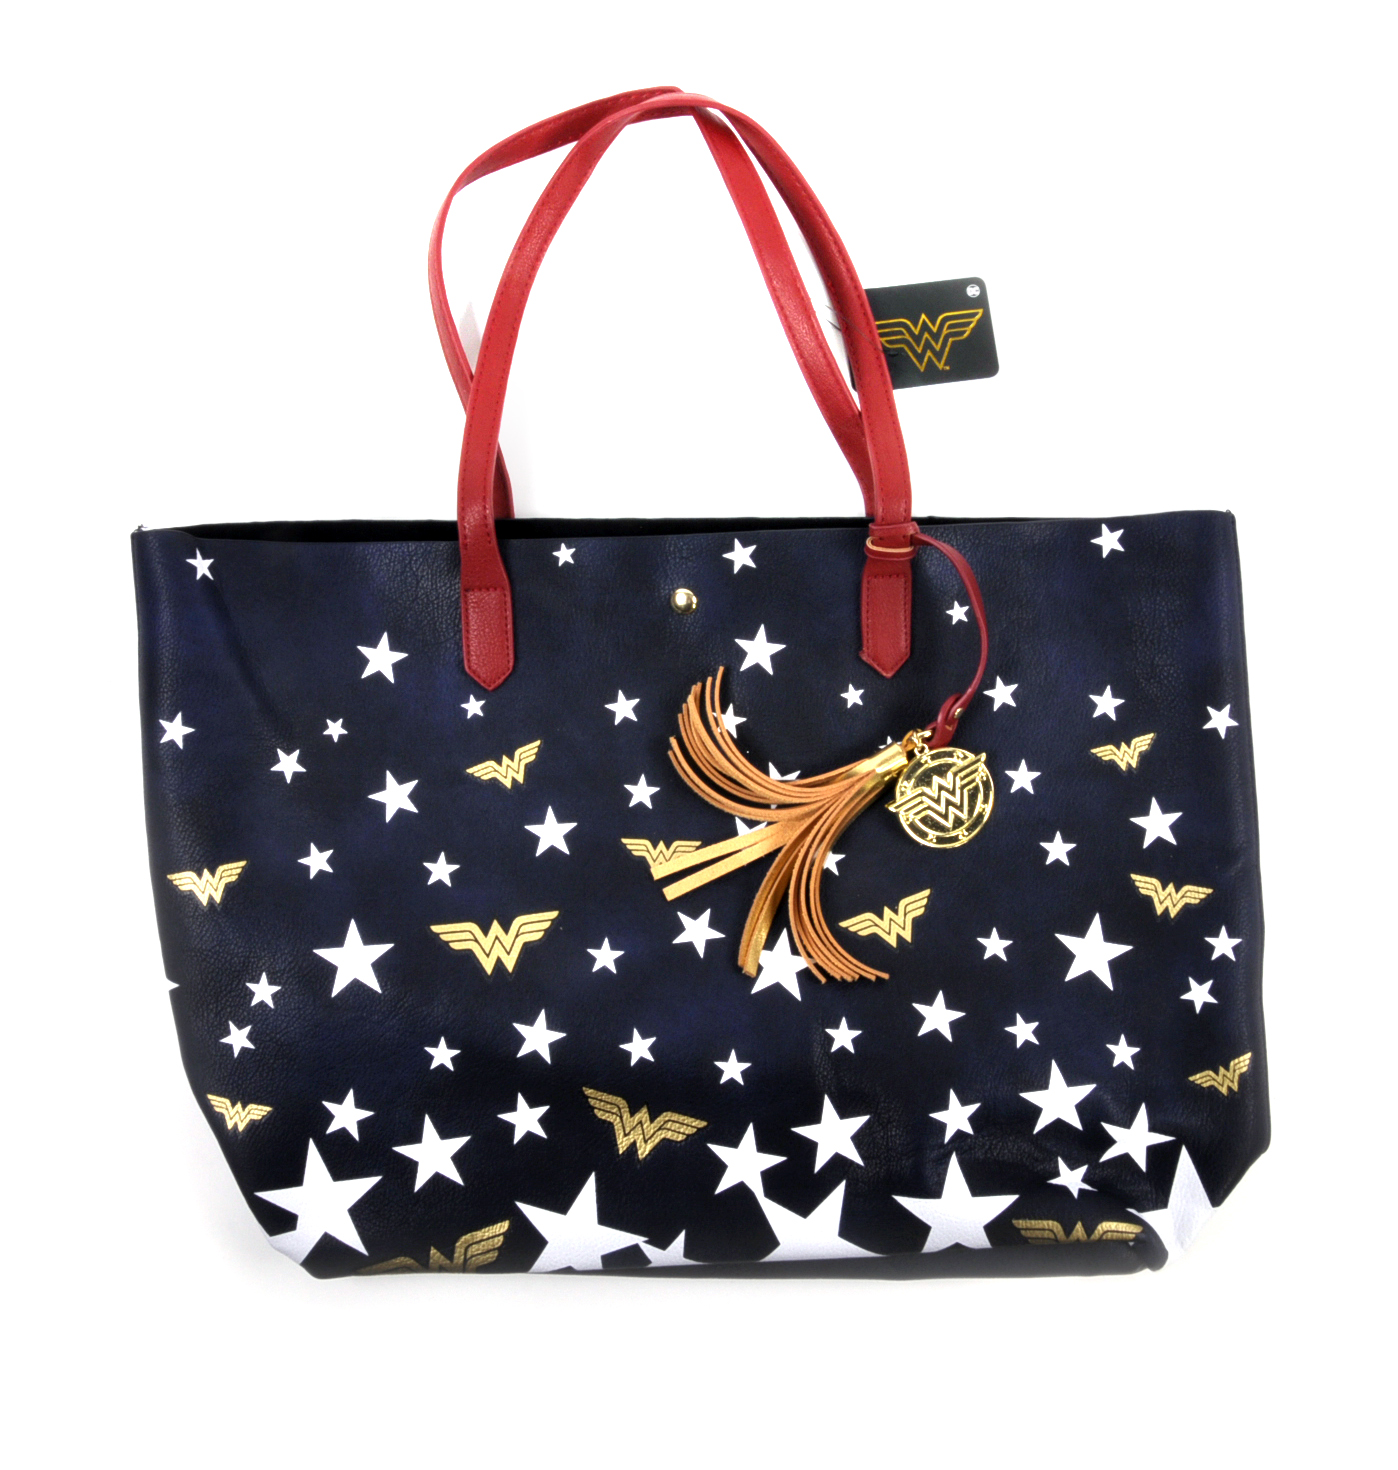 Wonder Woman Superstar Tote Bag Pink Cat Shop